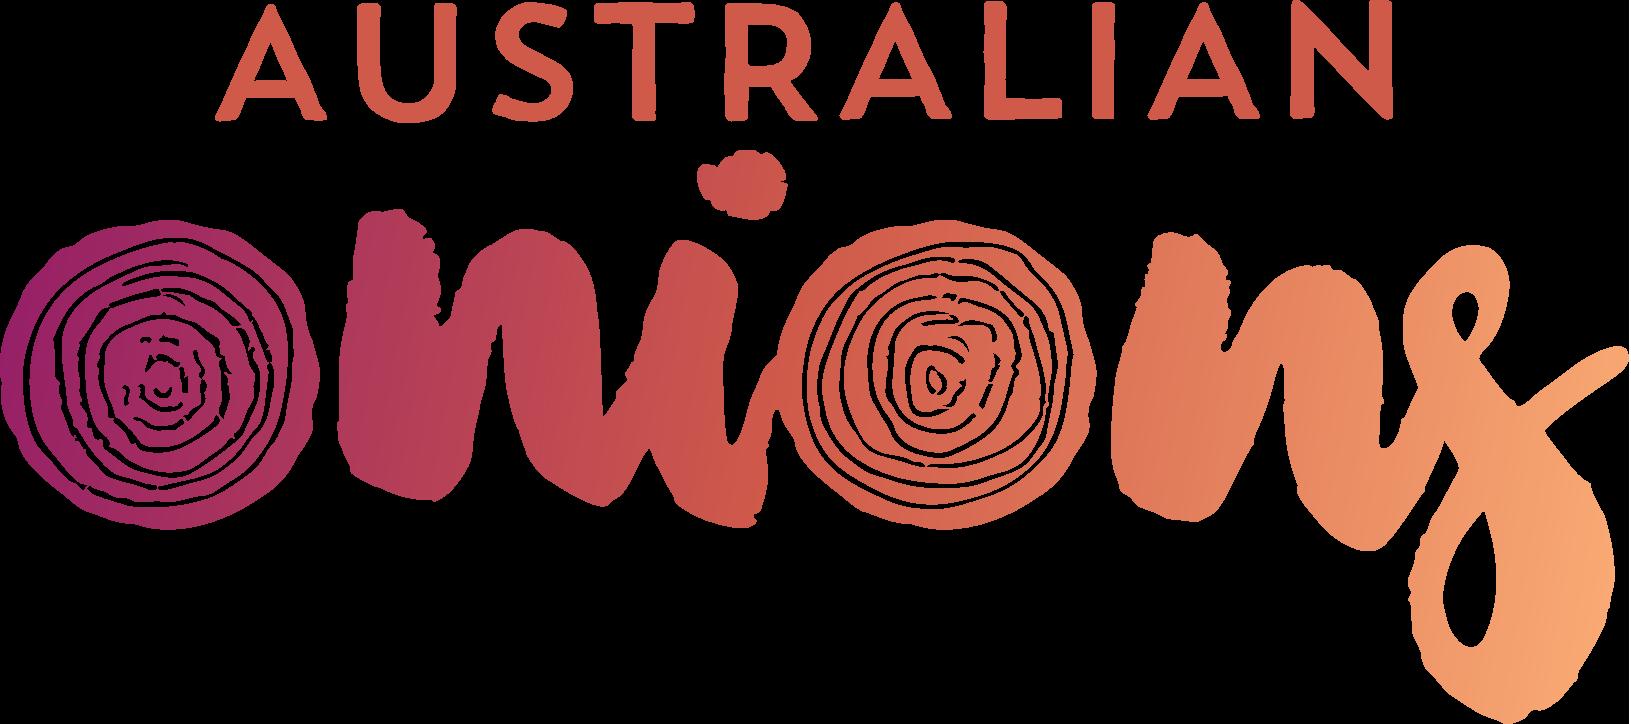 Australian Onions